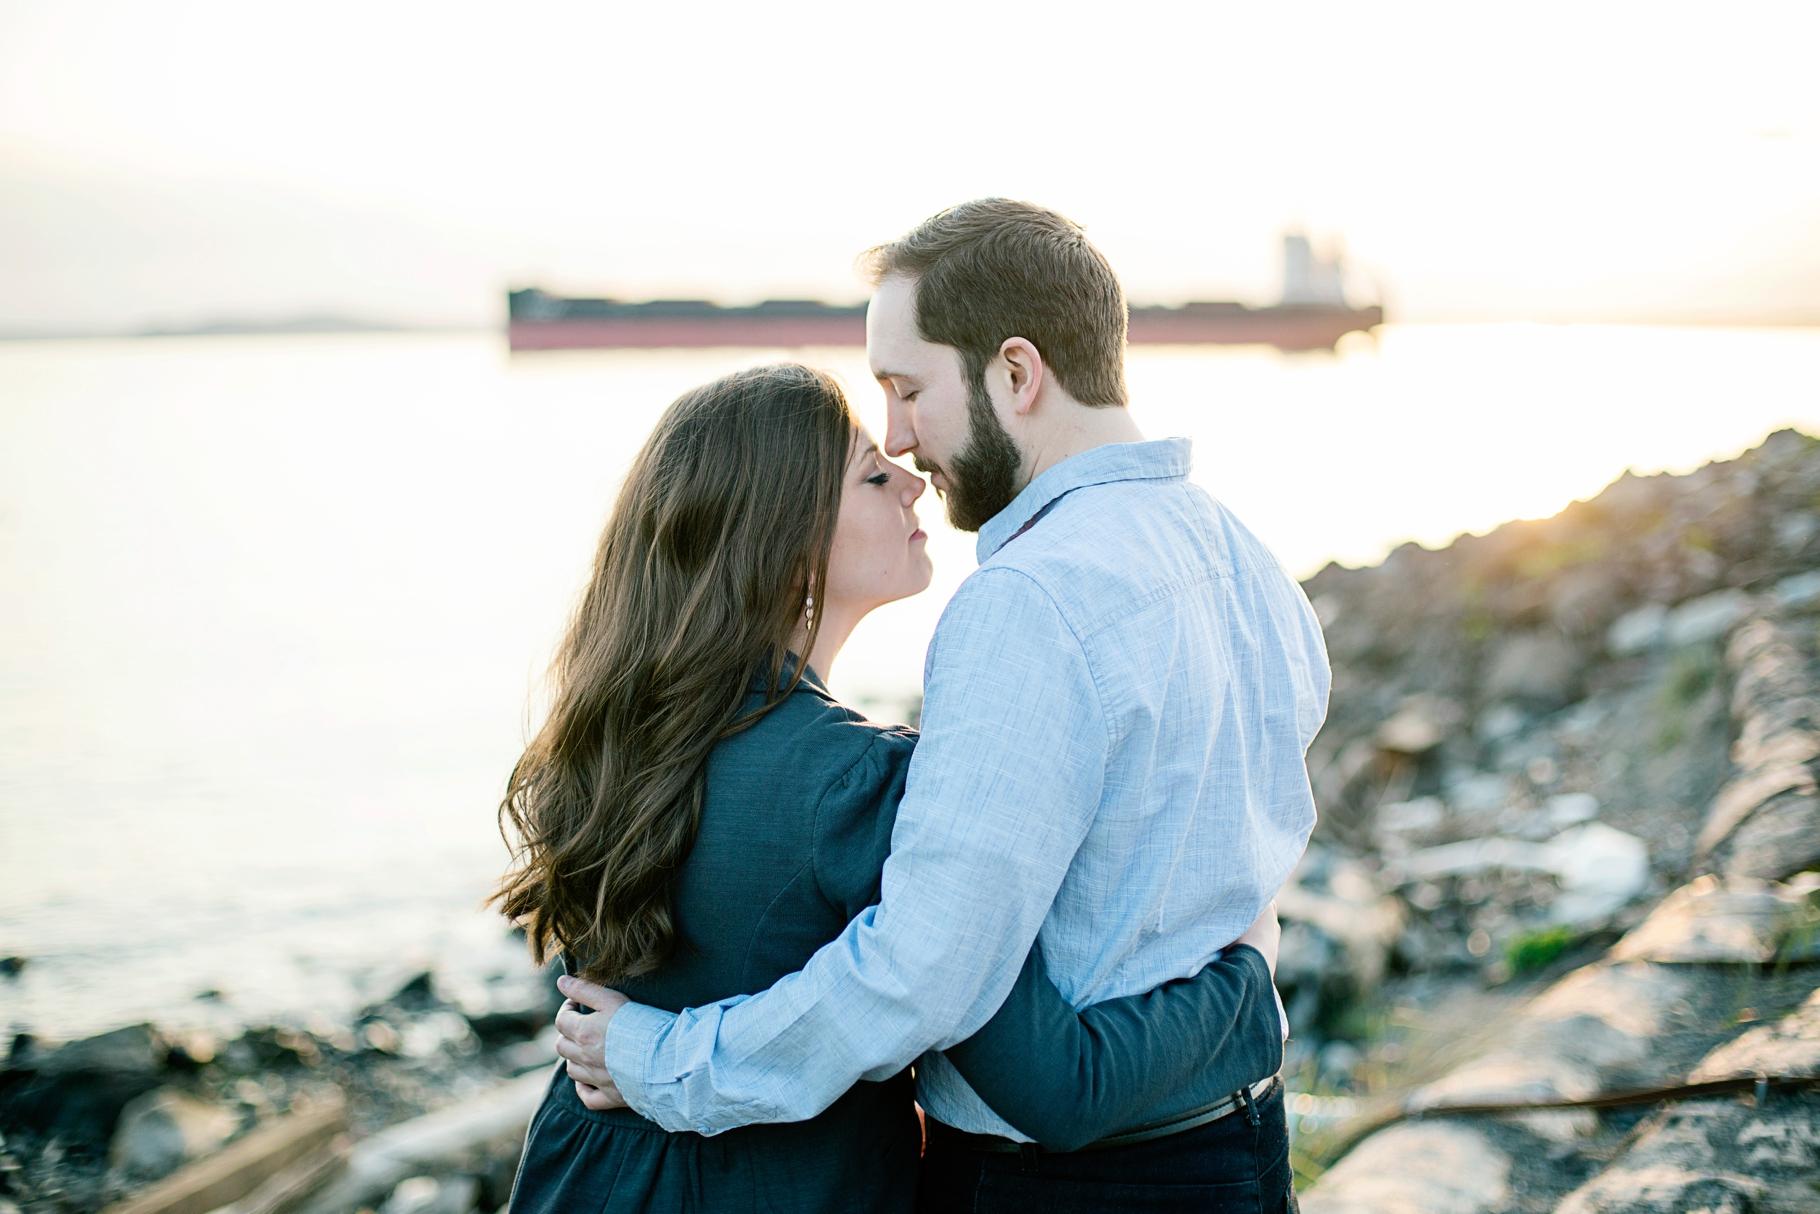 11-Pacfic-Northwest-Engaged-Seattle-Waterfront-Myrtle-Edwards-Park-Romantic-Ocean-Sunset-Driftwood-Beach-Enagement-Photographer-Wedding-Photography-by-Betty-Elaine